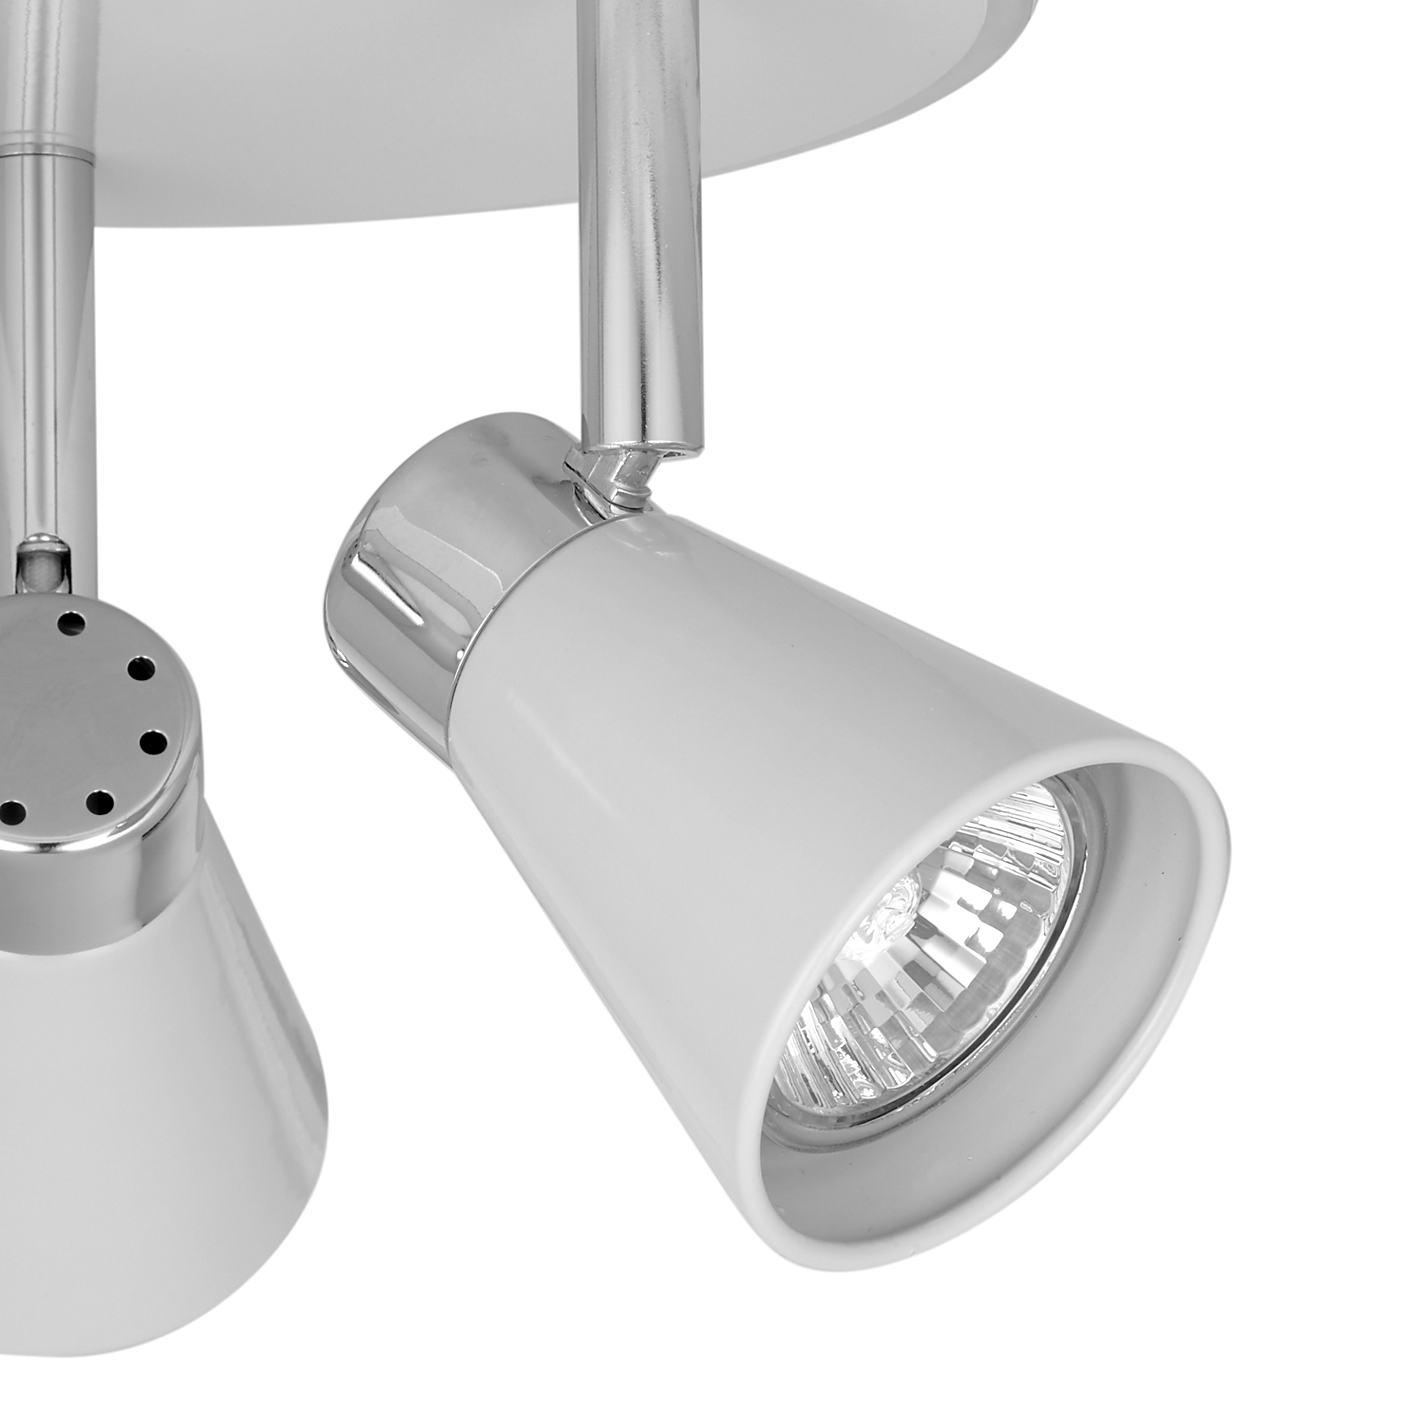 ... Buy John Lewis Logan GU10 LED Spotlight Plate 3 Light Online at johnlewis.com ...  sc 1 st  John Lewis & Buy John Lewis Logan GU10 LED Spotlight Plate 3 Light | John Lewis azcodes.com